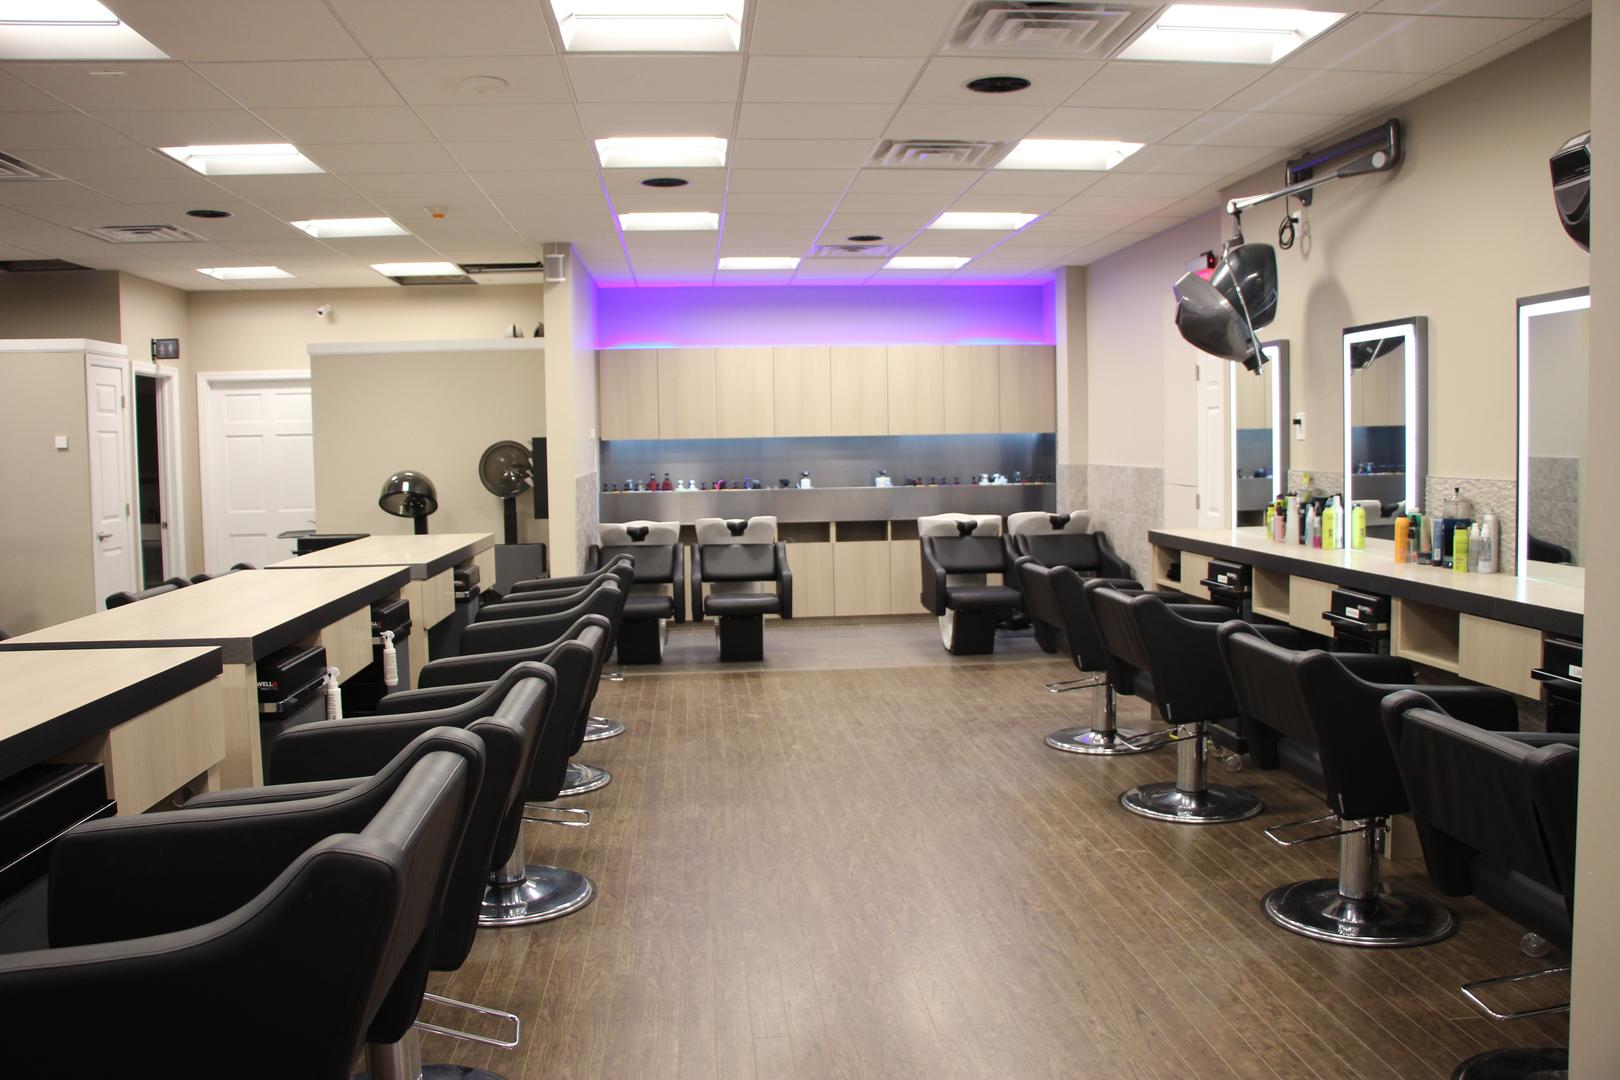 New york nassau county rockville centre - Expert Hair Color In Rockville Centre Ny